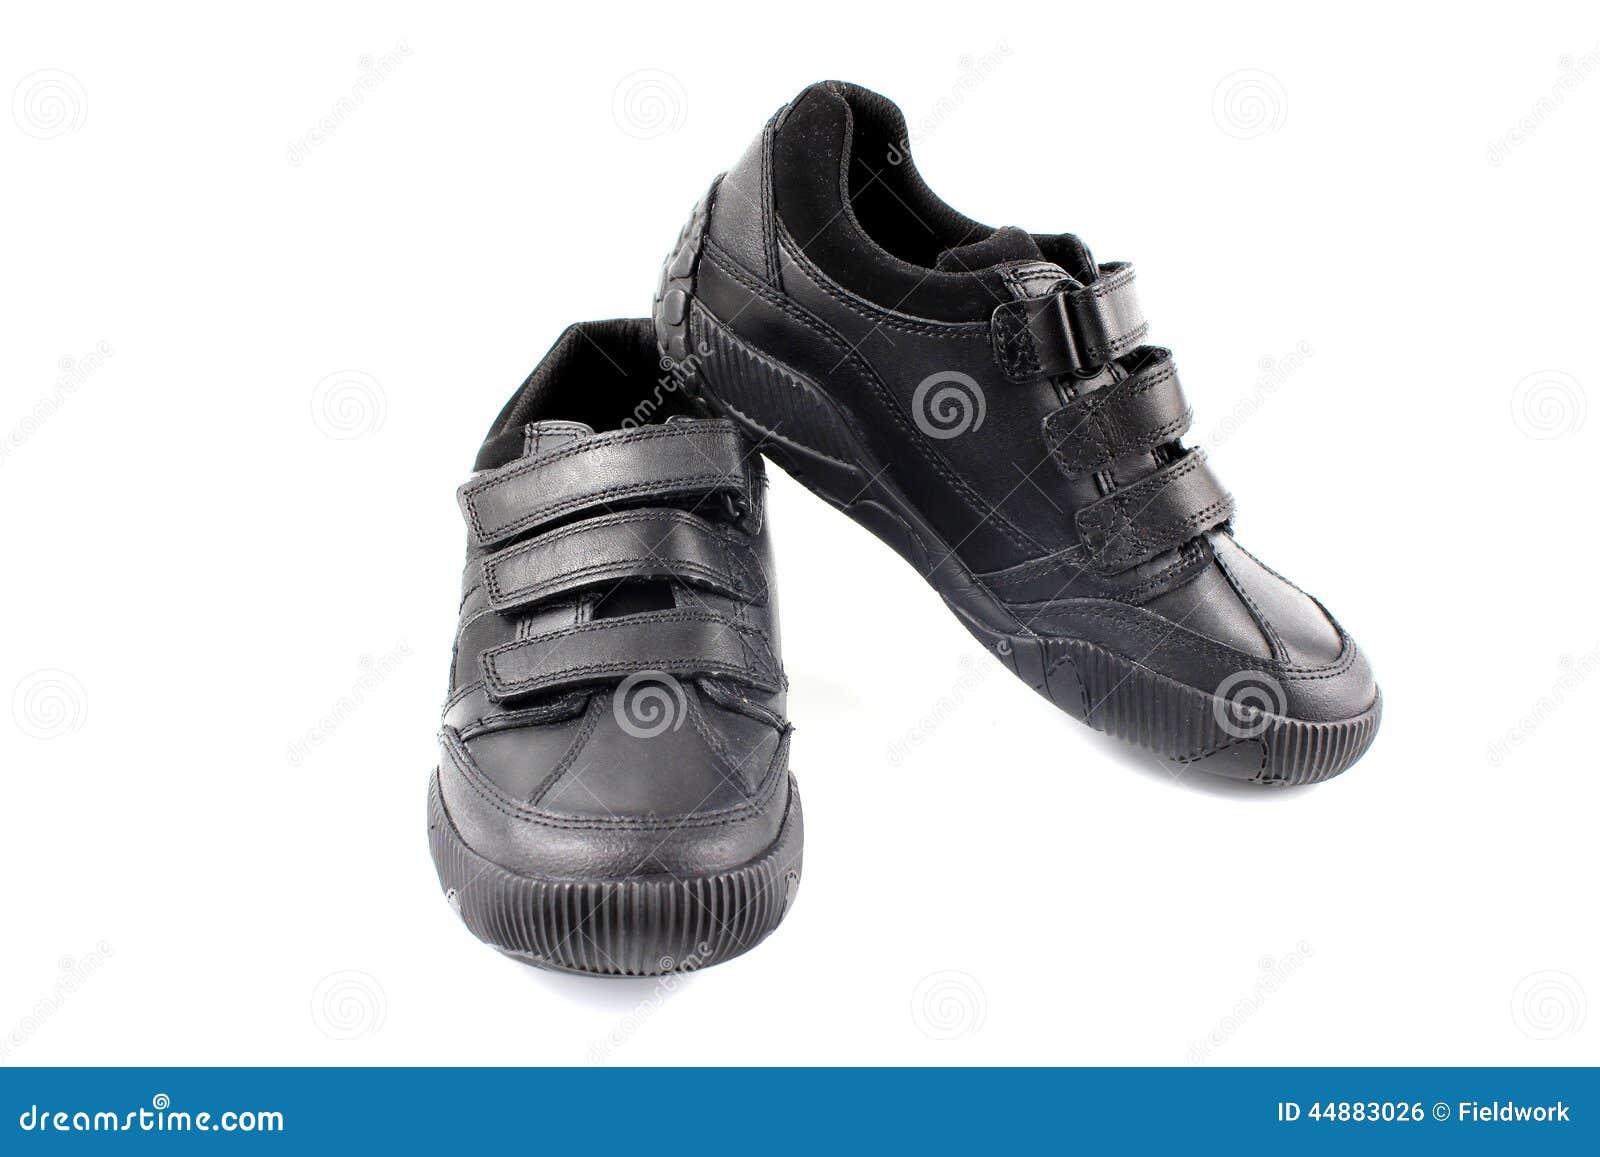 Boys Children S New Black School Shoes